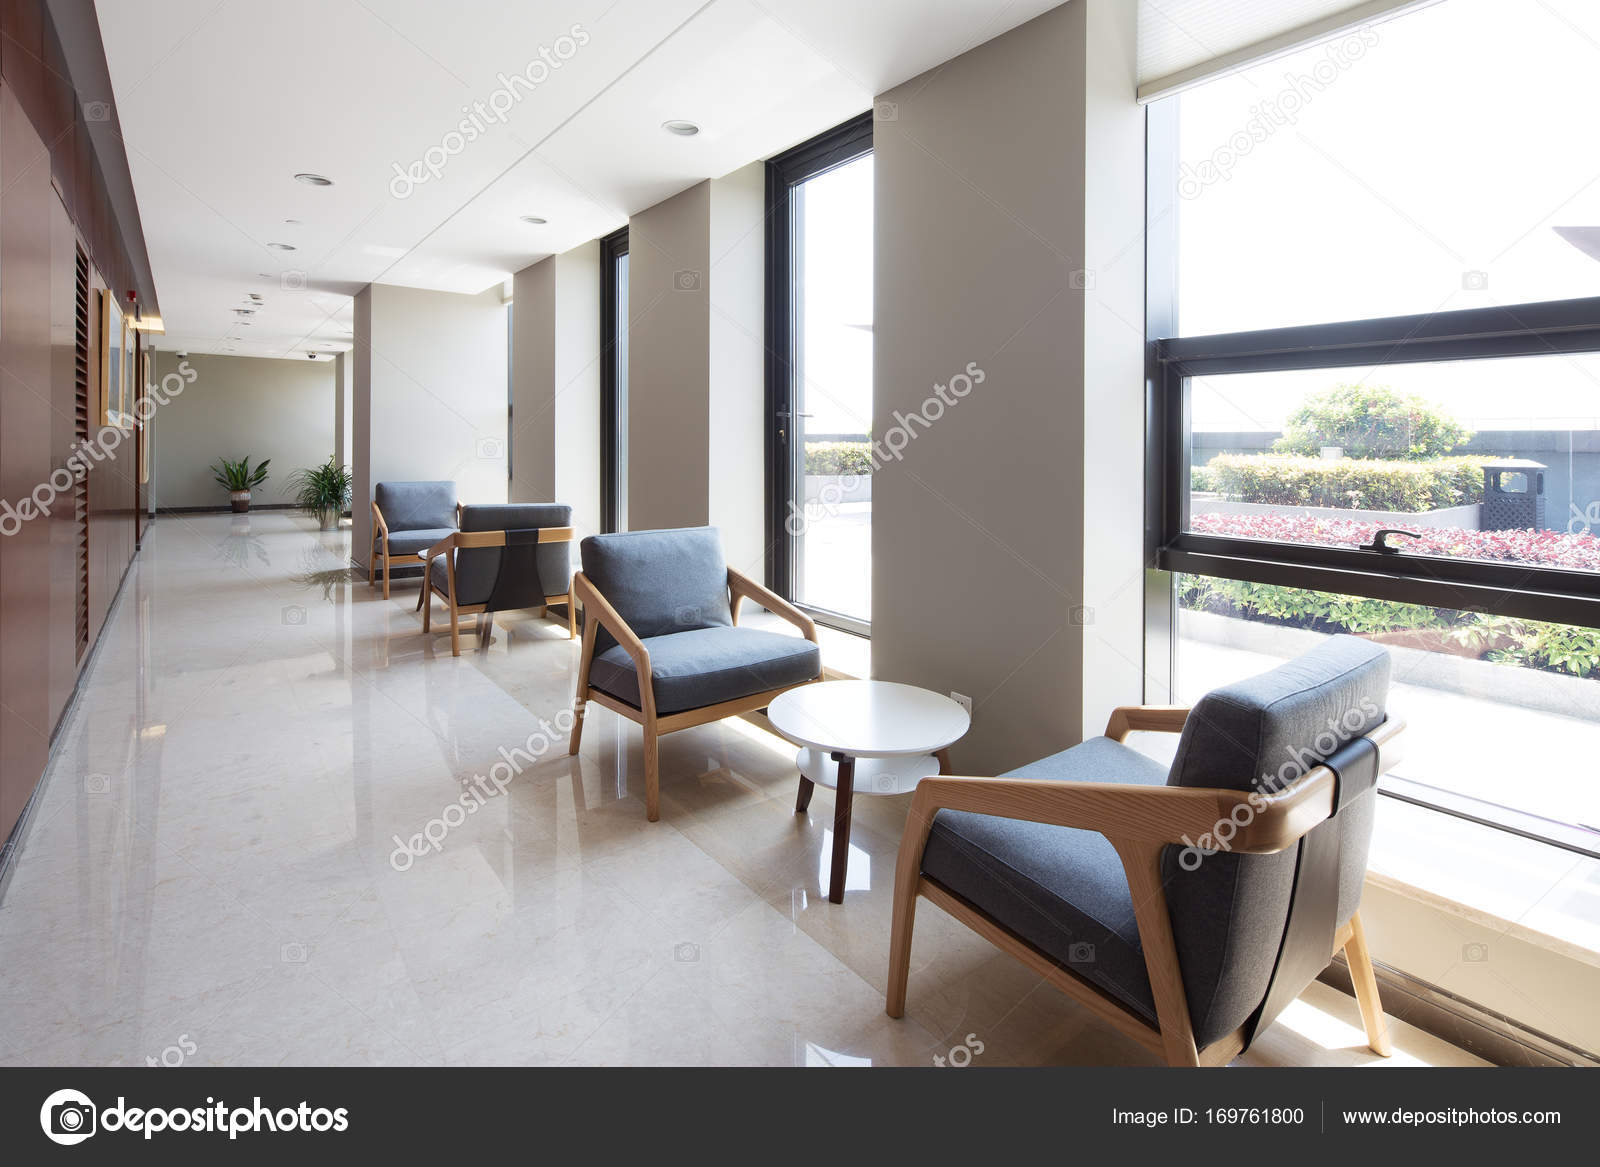 Interieur van moderne corridor u2014 stockfoto © zhudifeng #169761800